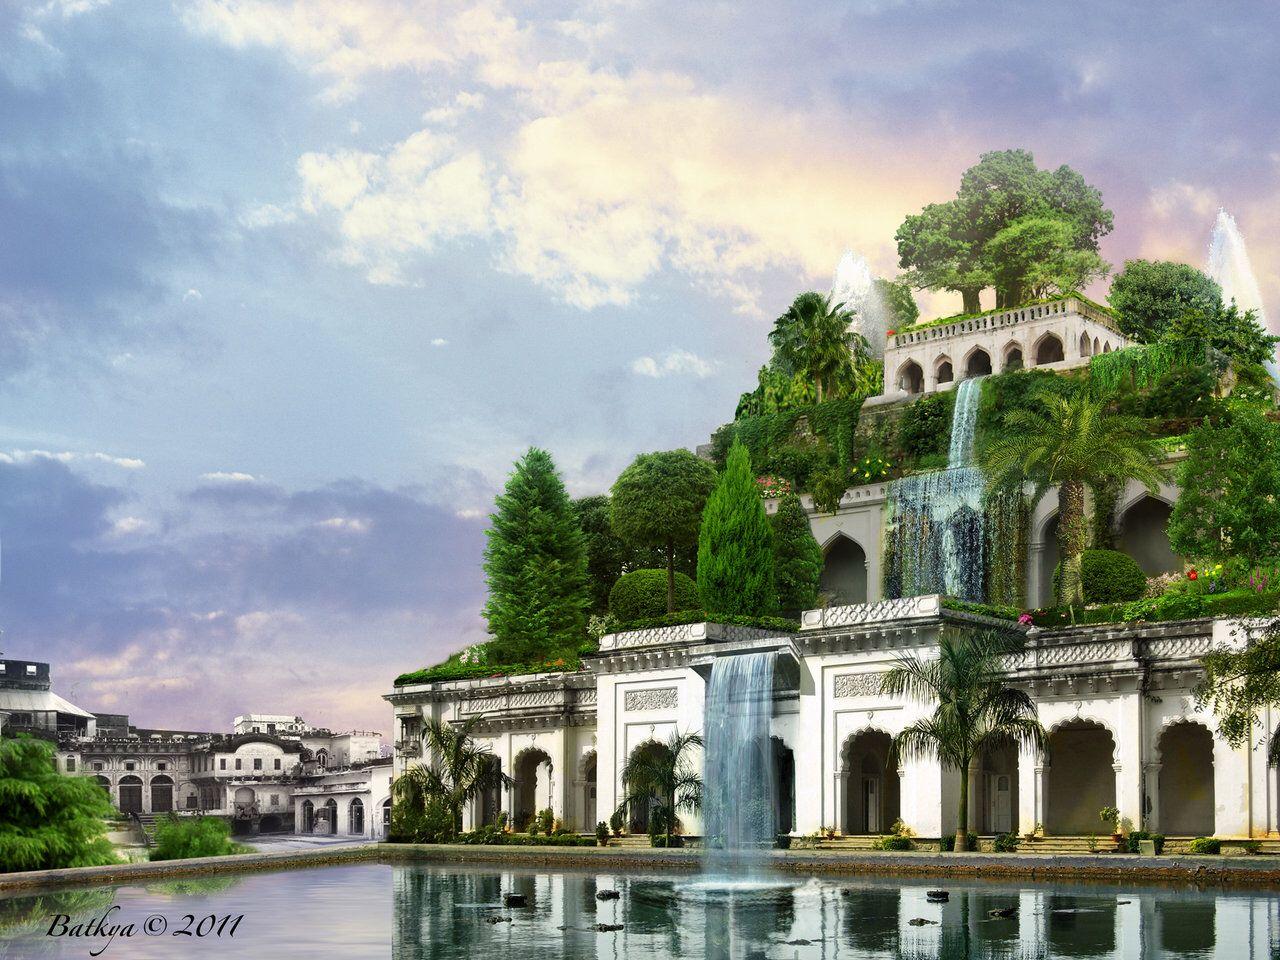 95cda7ff82cddcae9125e658502b90a5 - The Hanging Gardens Of Babylon Was Built By